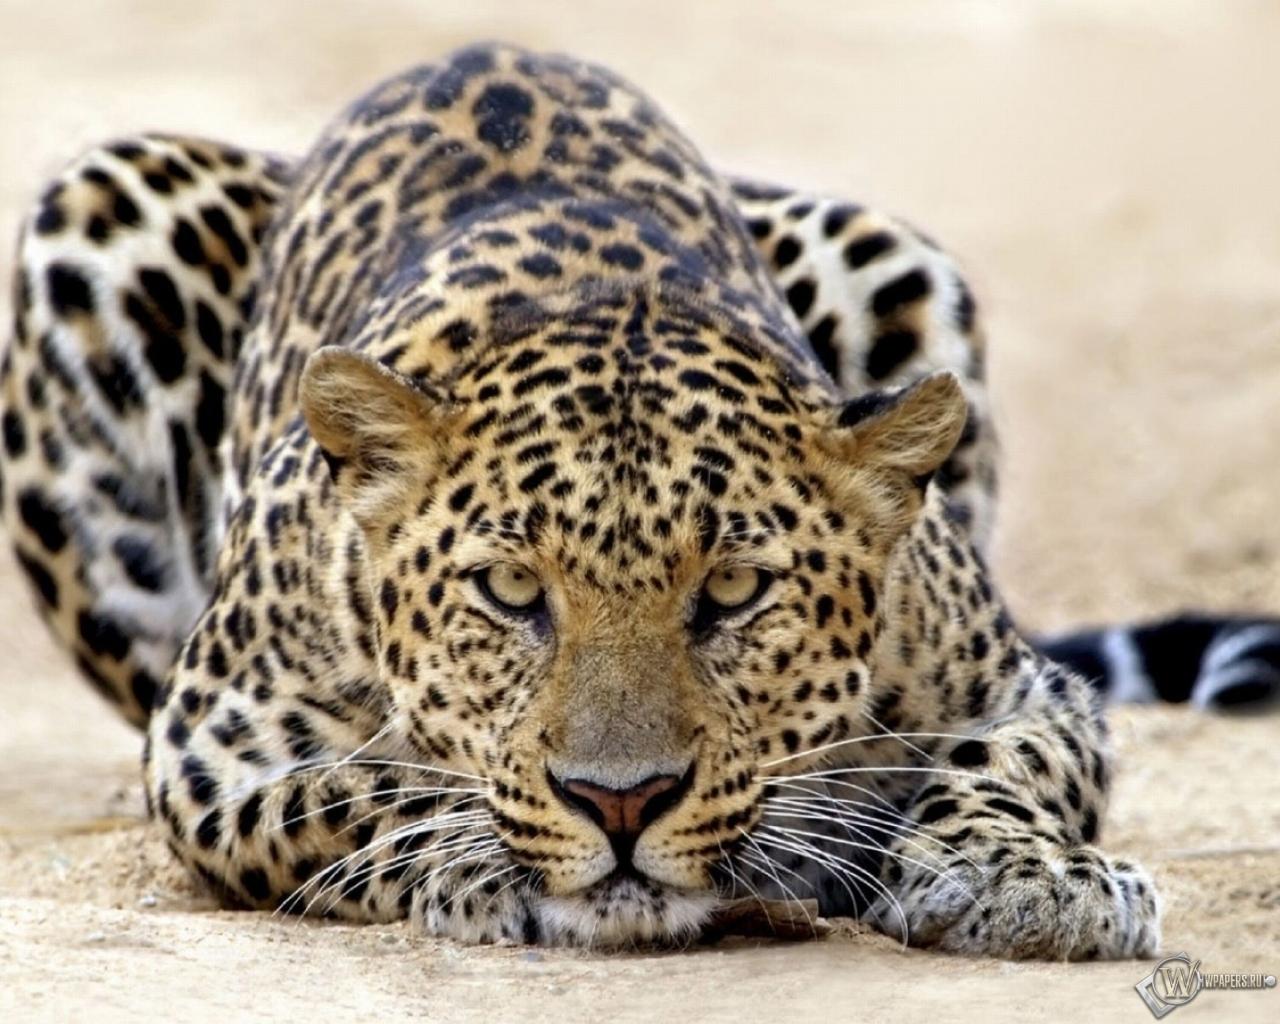 Пятнистый леопард 1280x1024